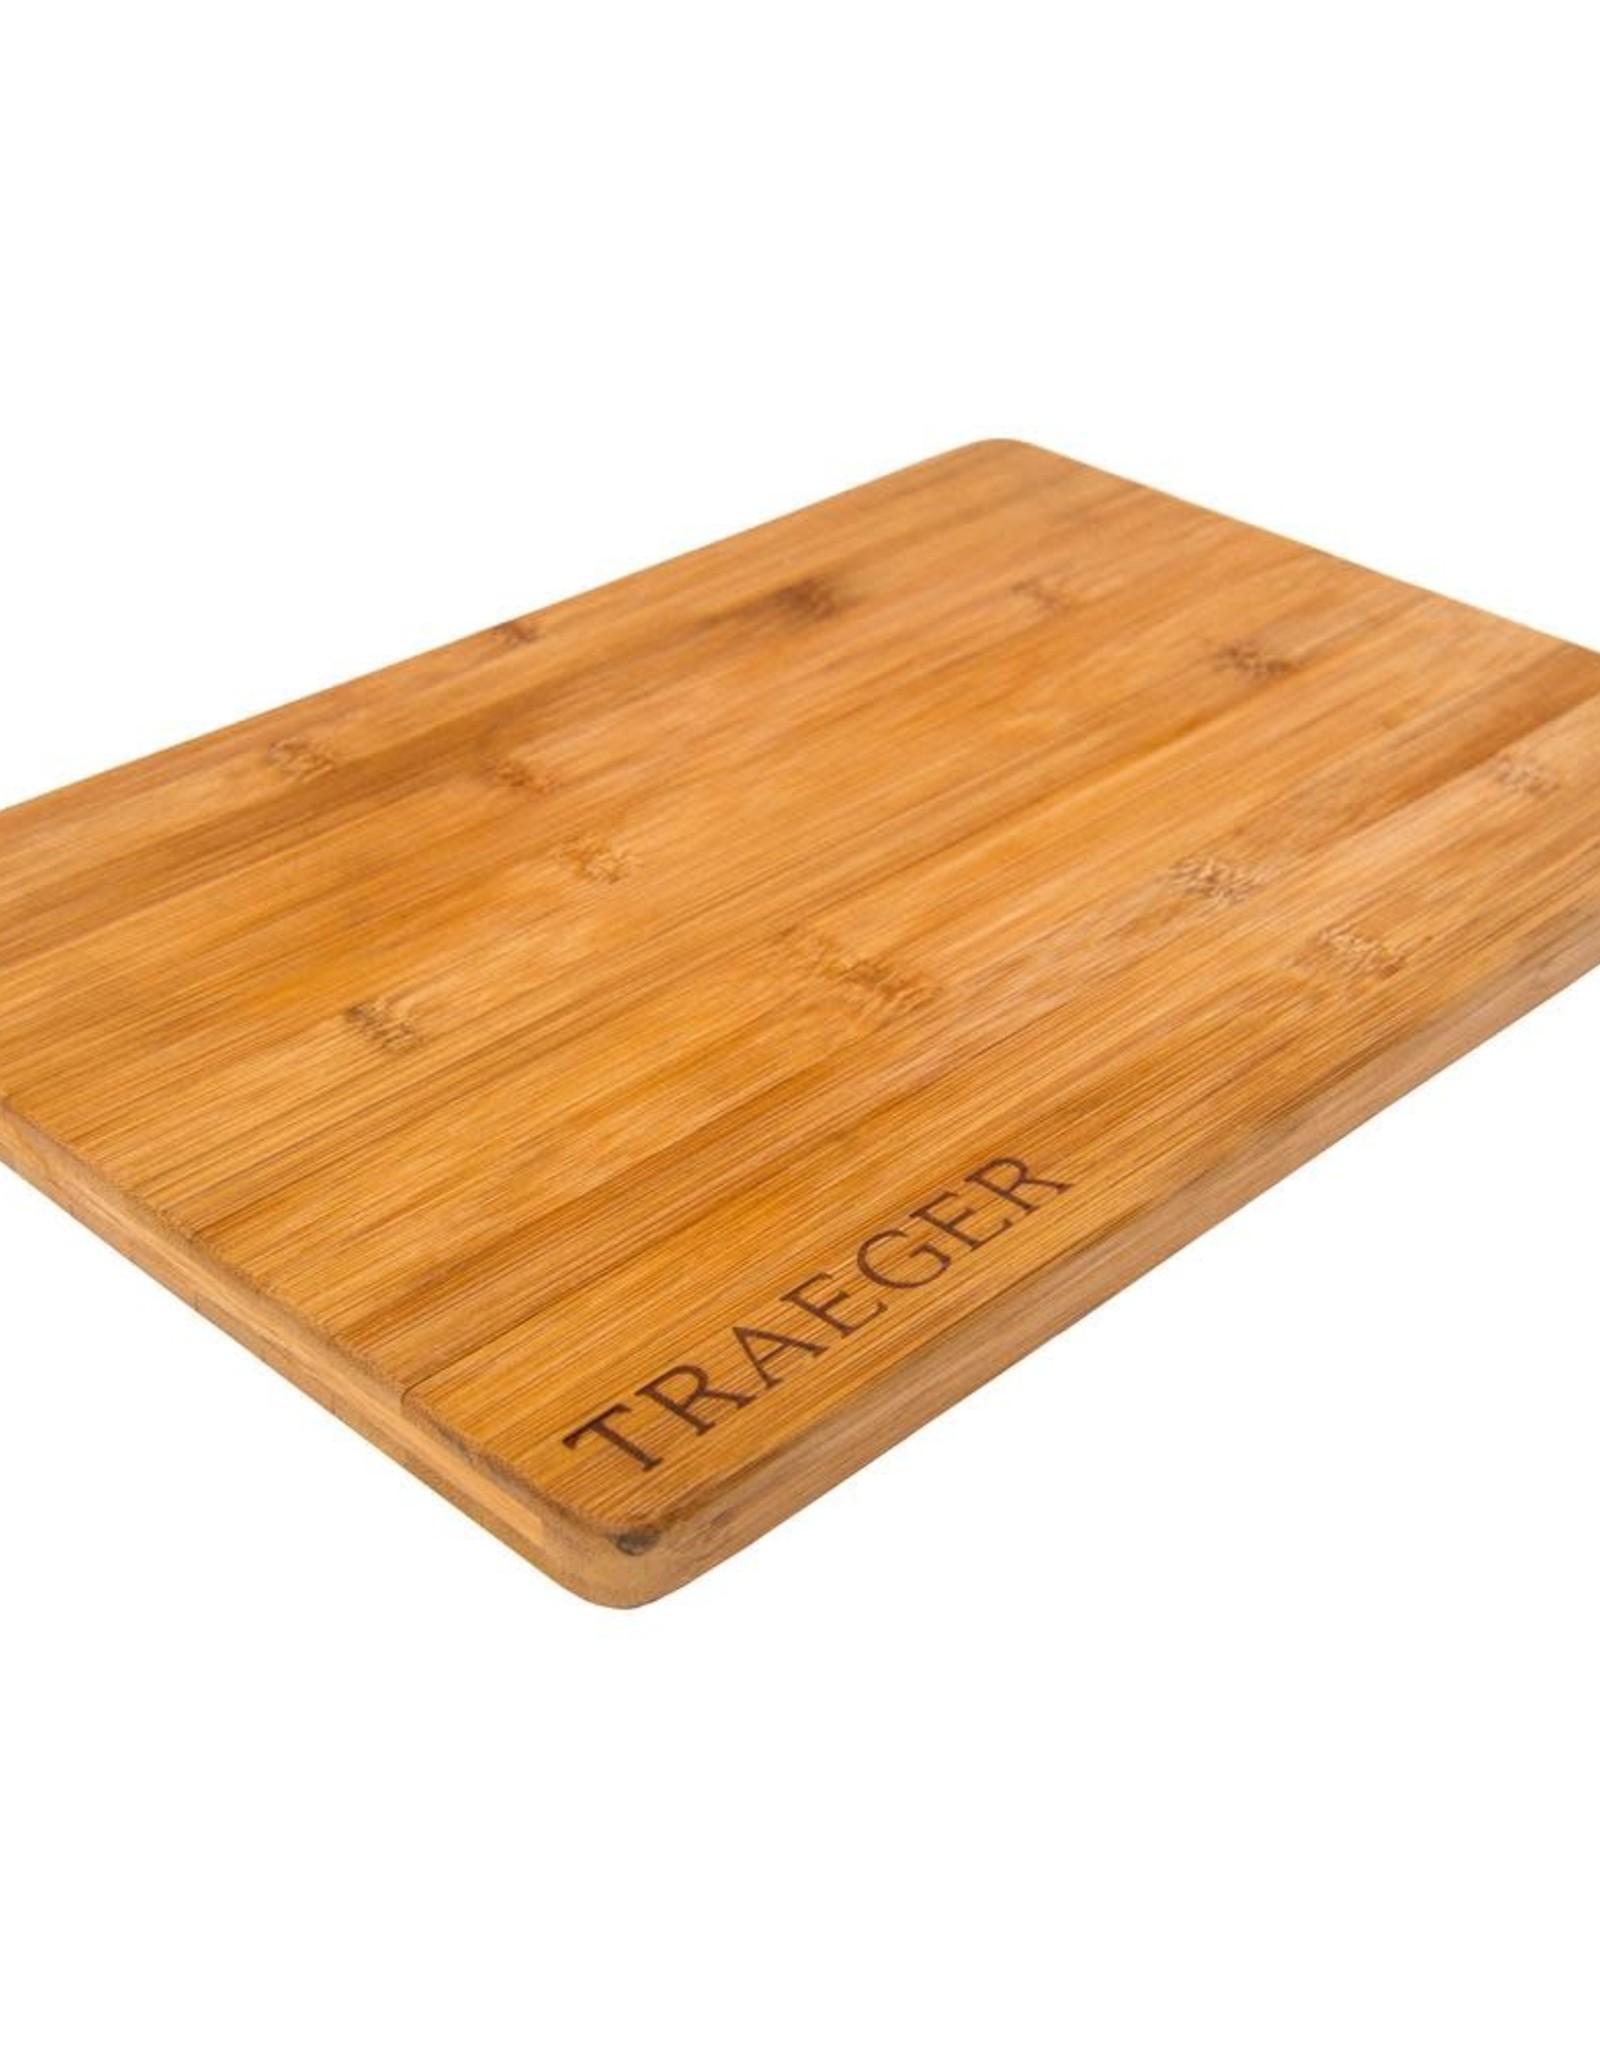 Traeger Traeger Magnetic Bamboo Cutting Board - BAC406